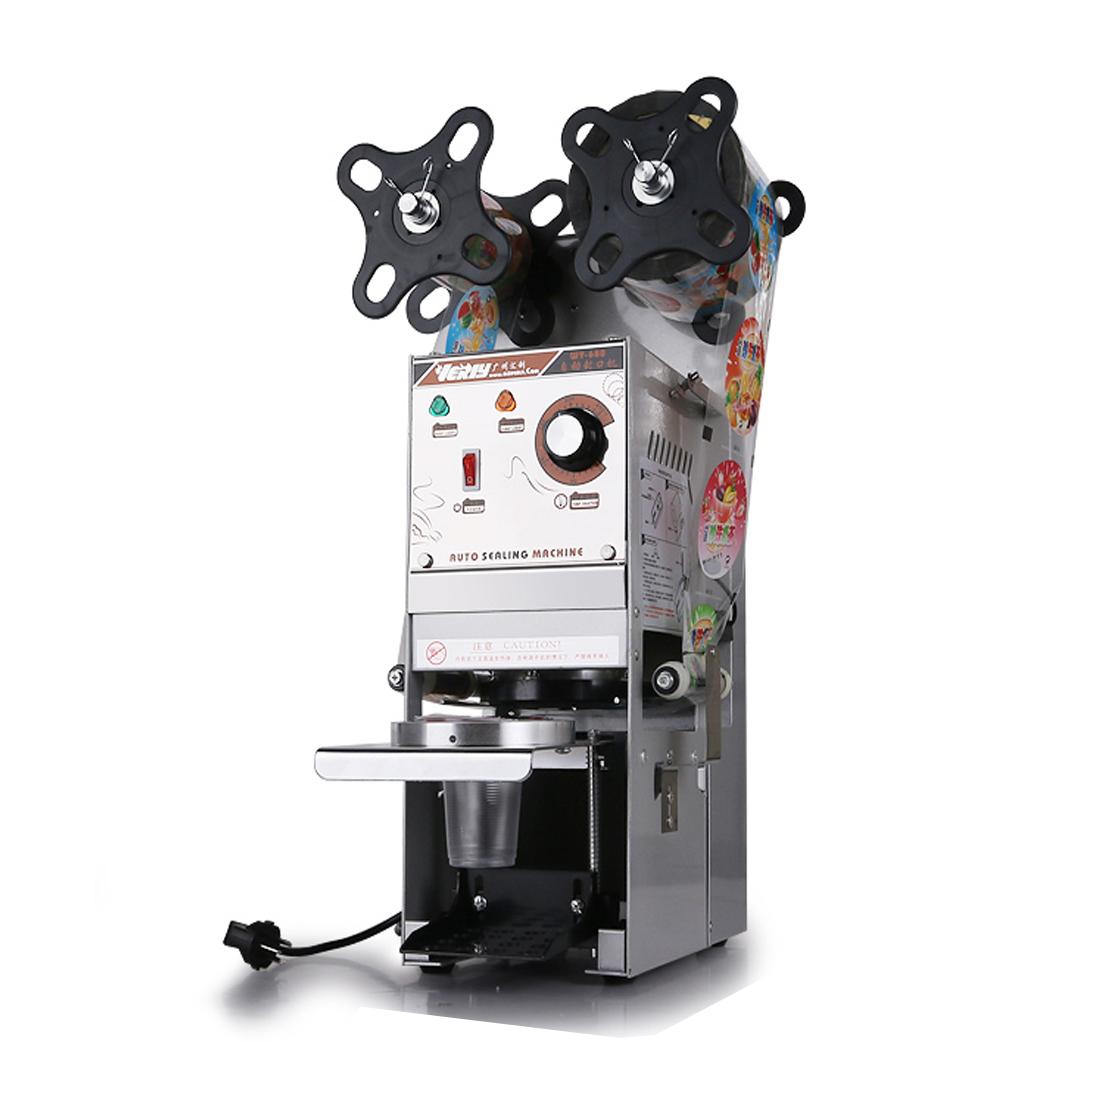 Máy dán cốc tự động WY-680 tốt